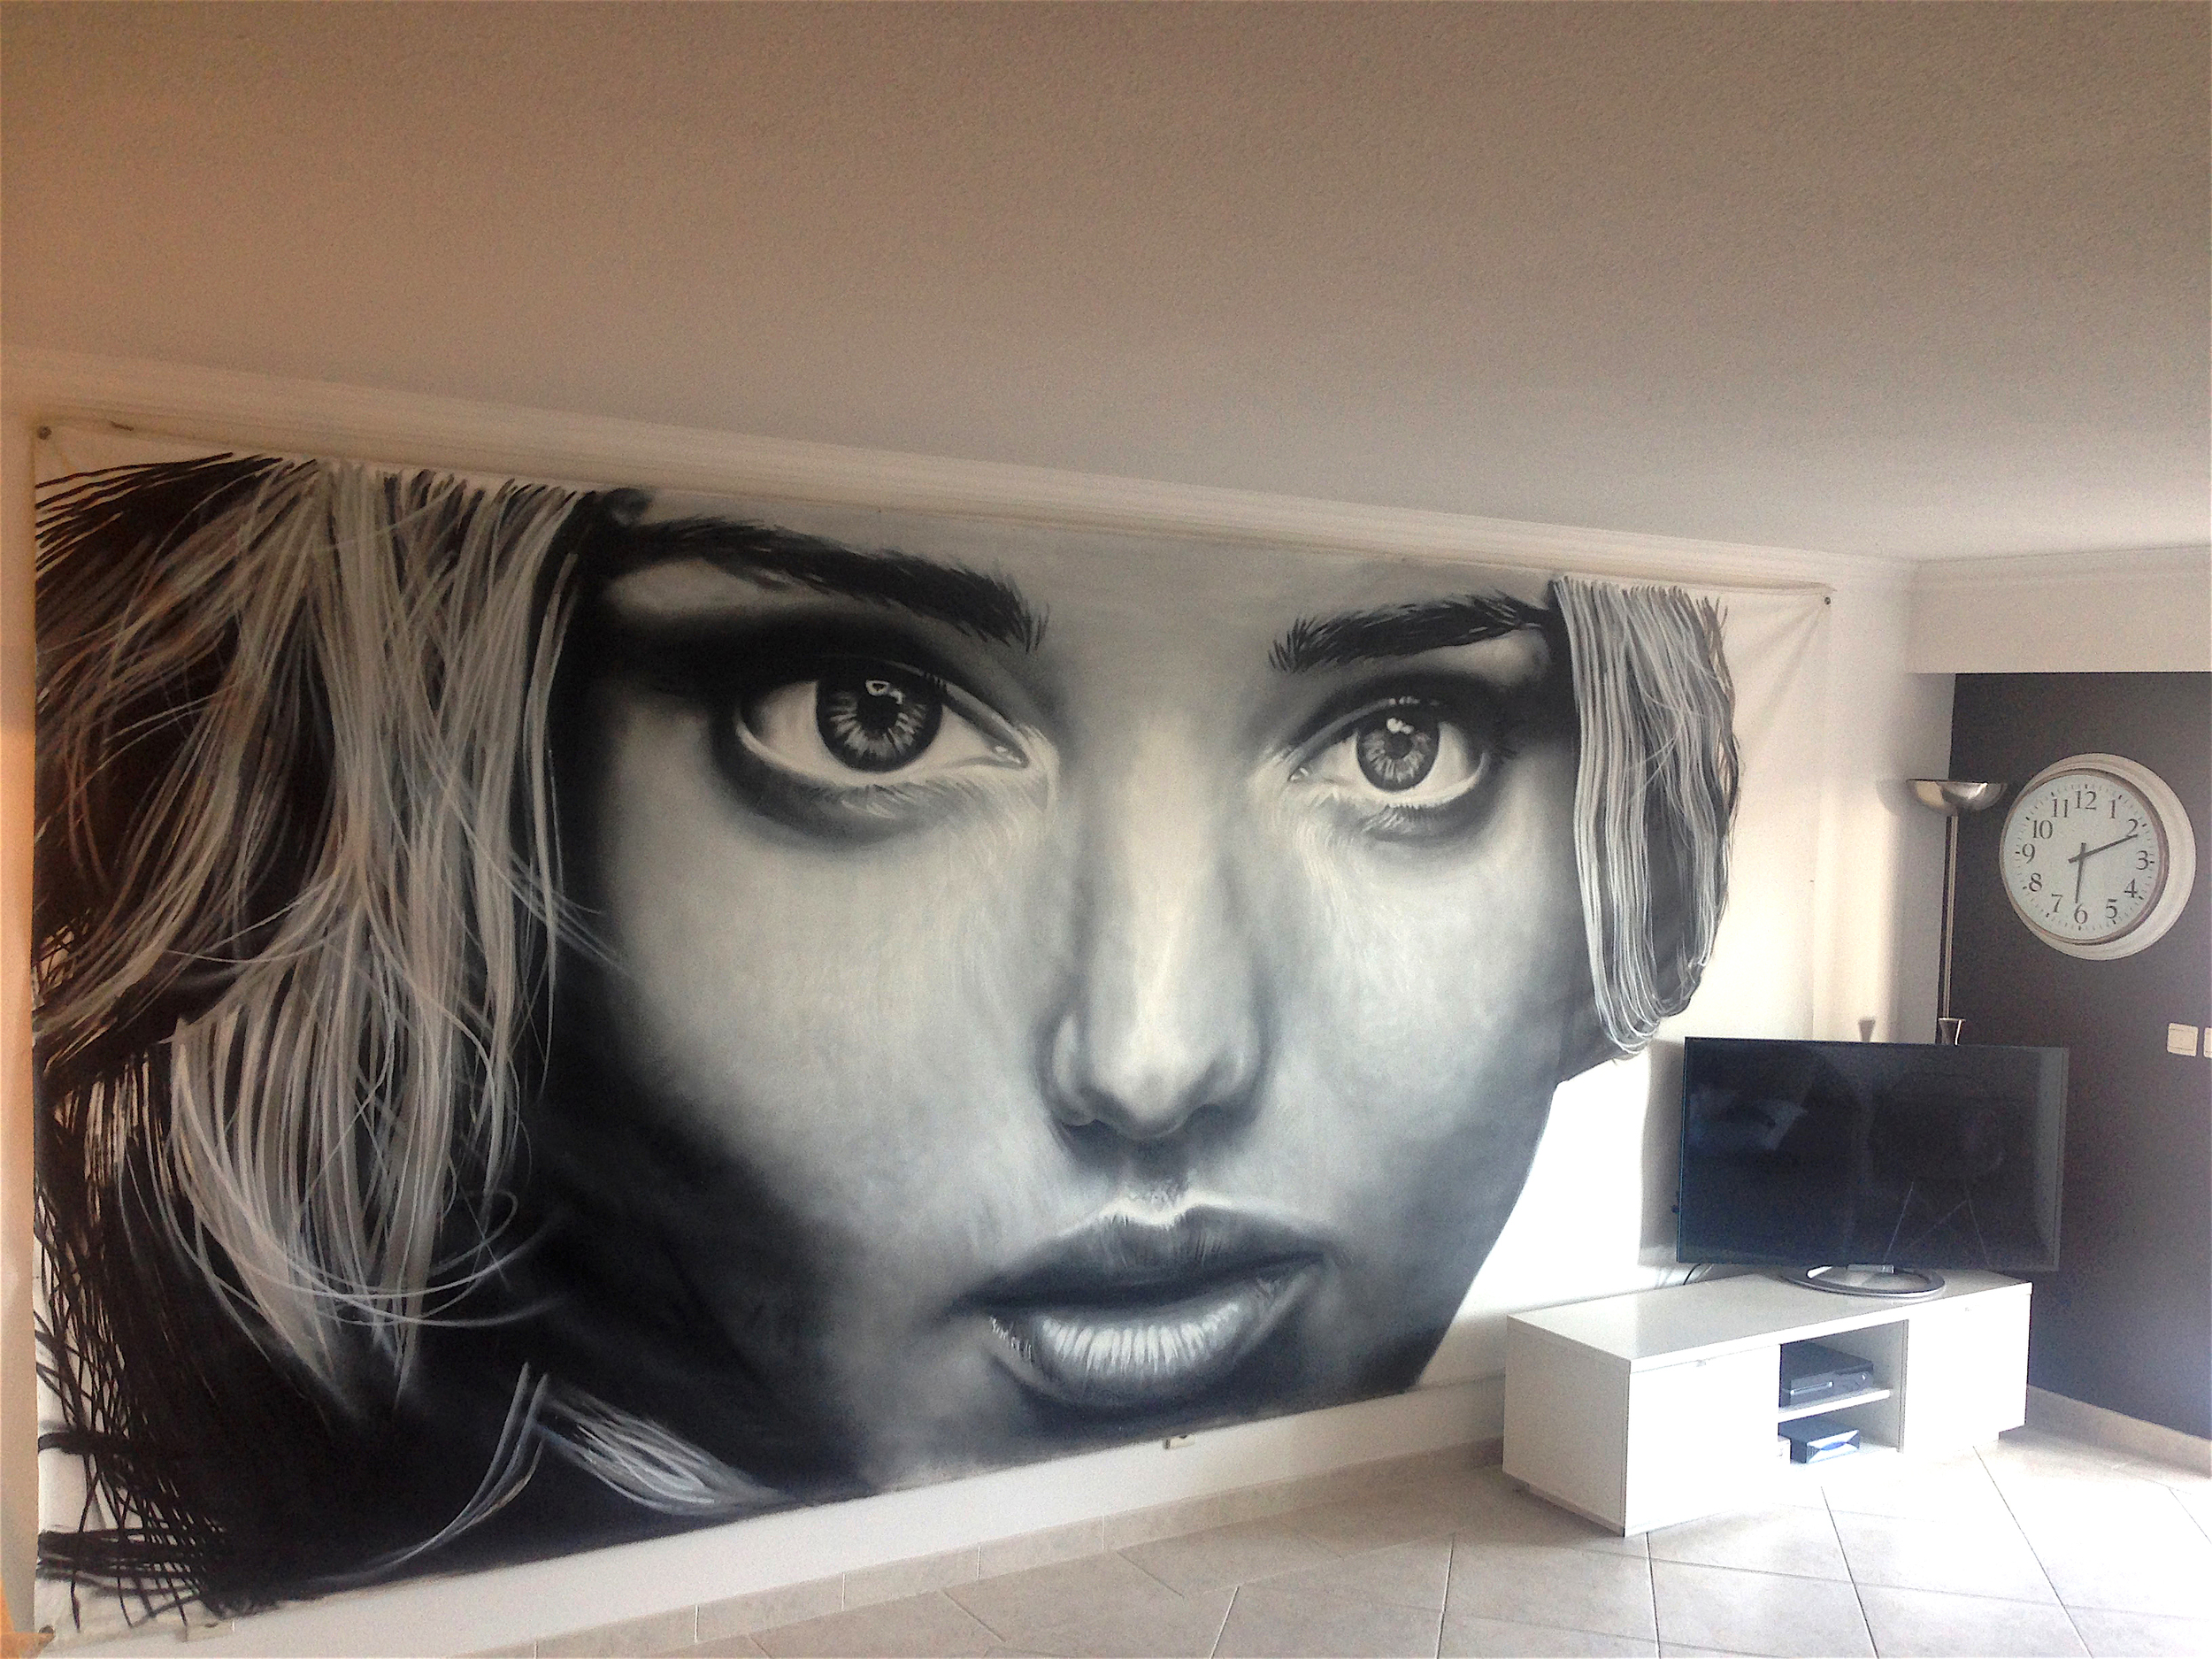 Spray sur toile - 210 x 440cm - 2013